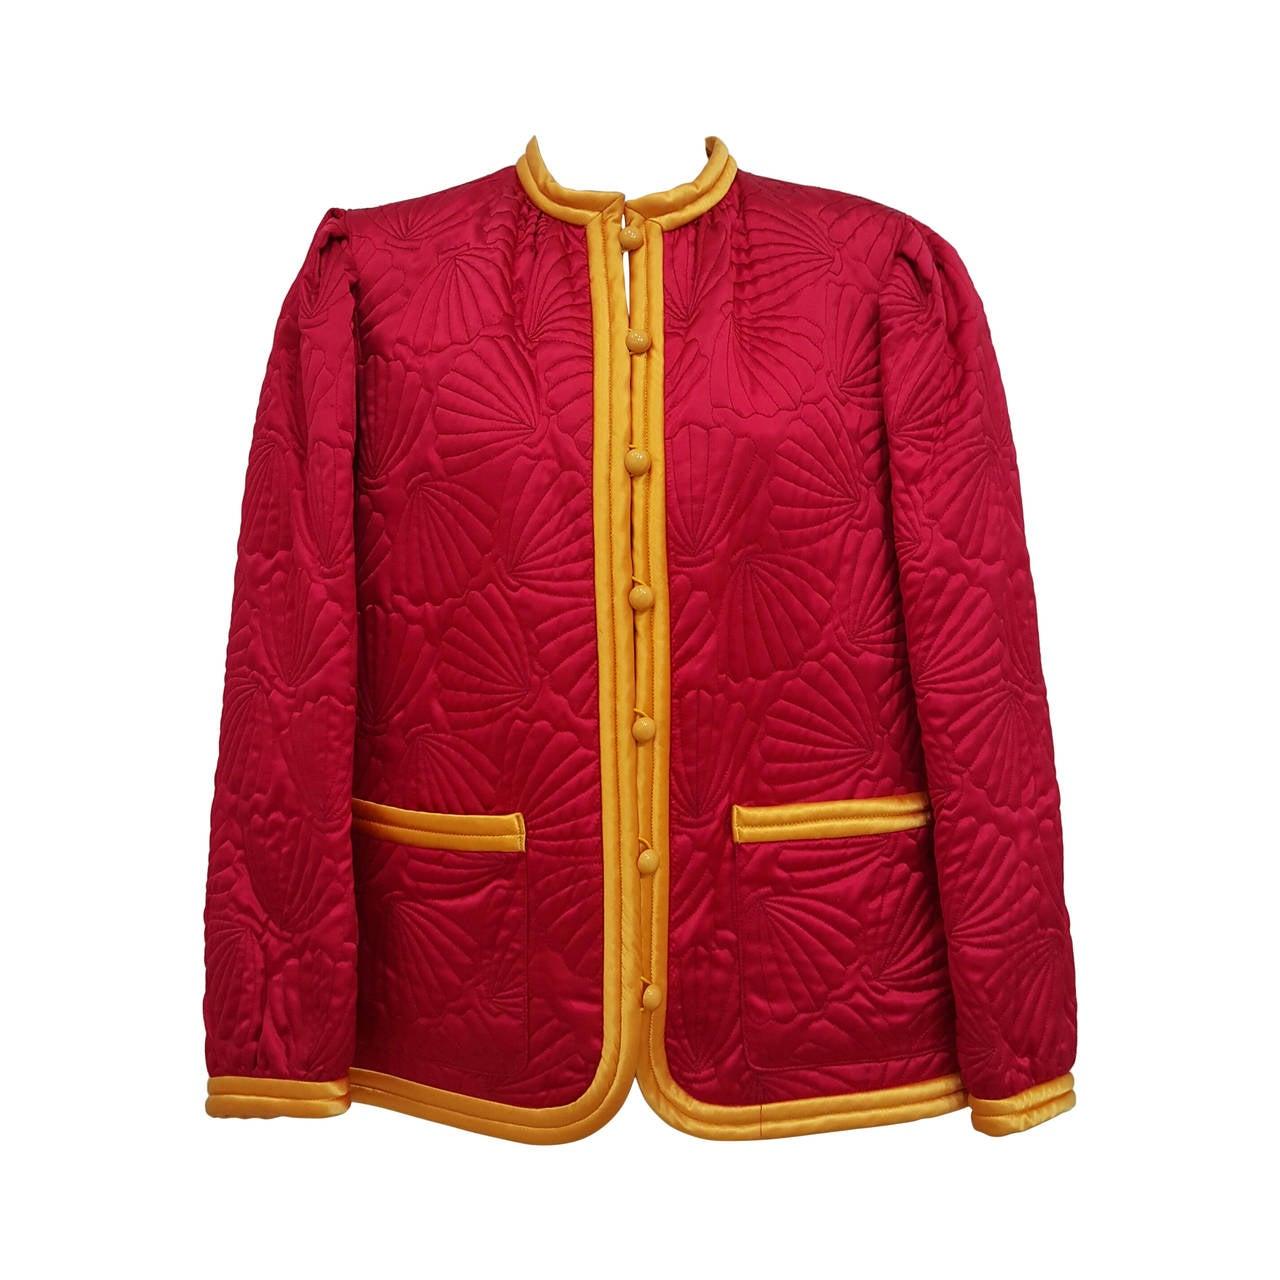 Buy low price, high quality red silk jacket with worldwide shipping on bigframenetwork.ga